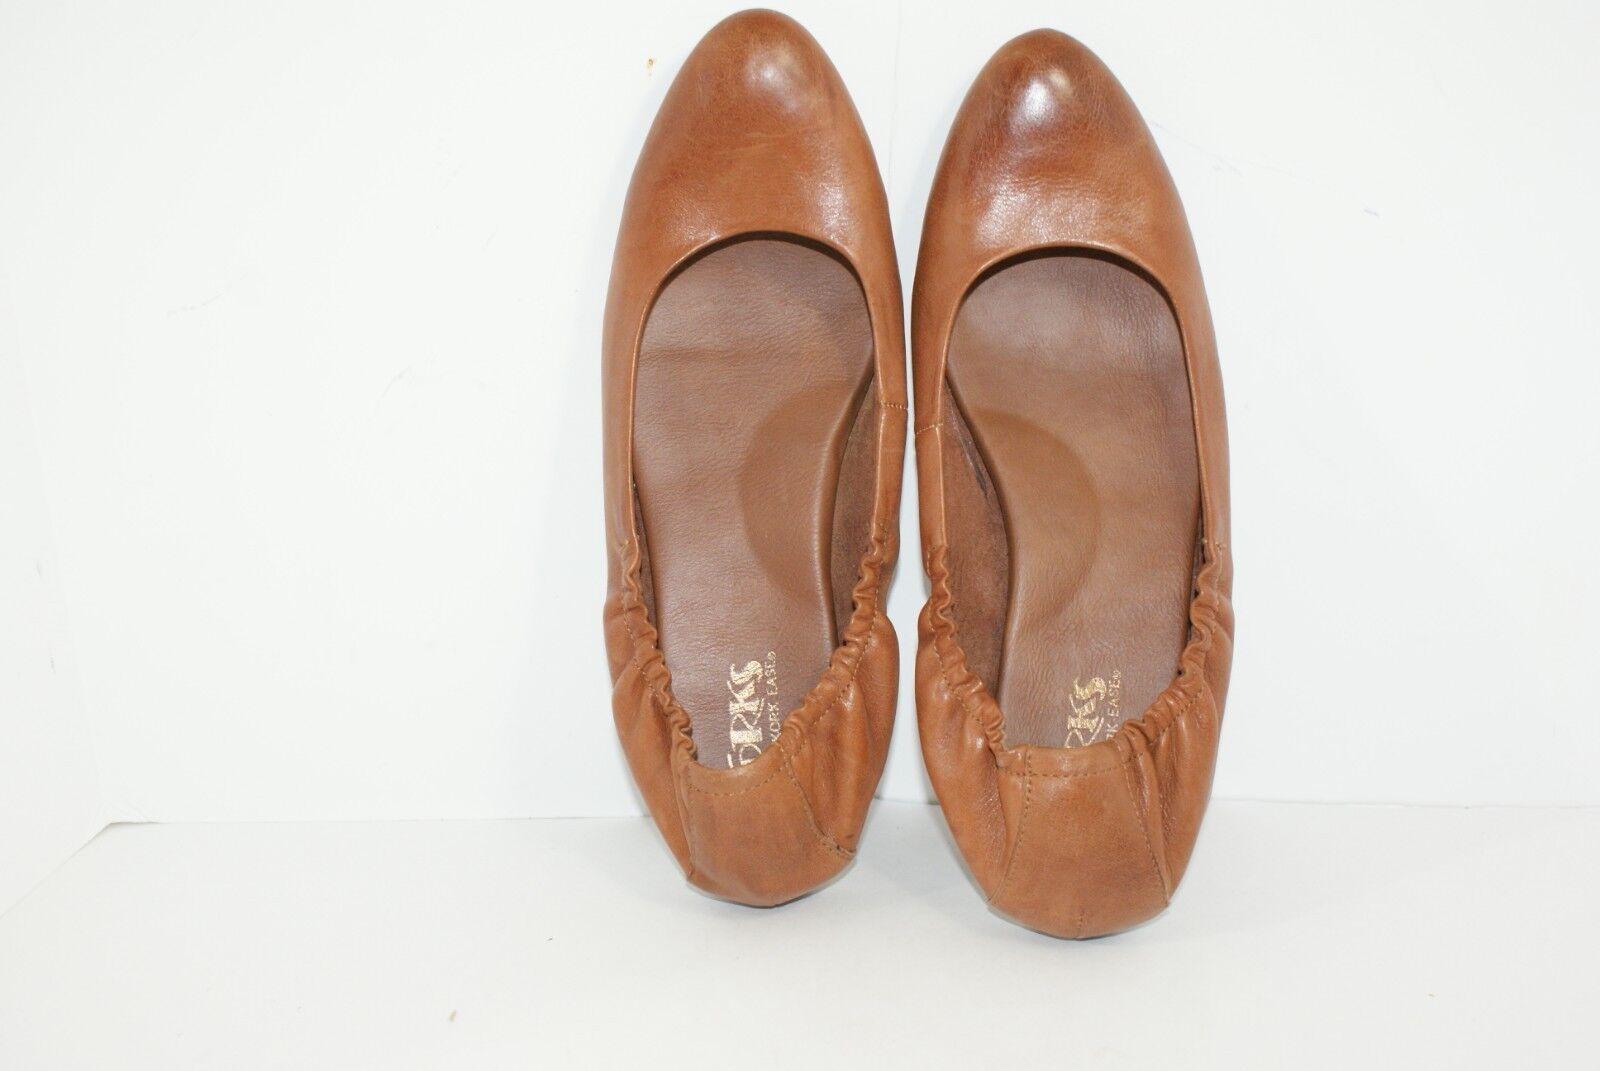 Korks by Kork Ease Julie Women's 10 M Coffee Brown Leather Slip On Ballet Flats